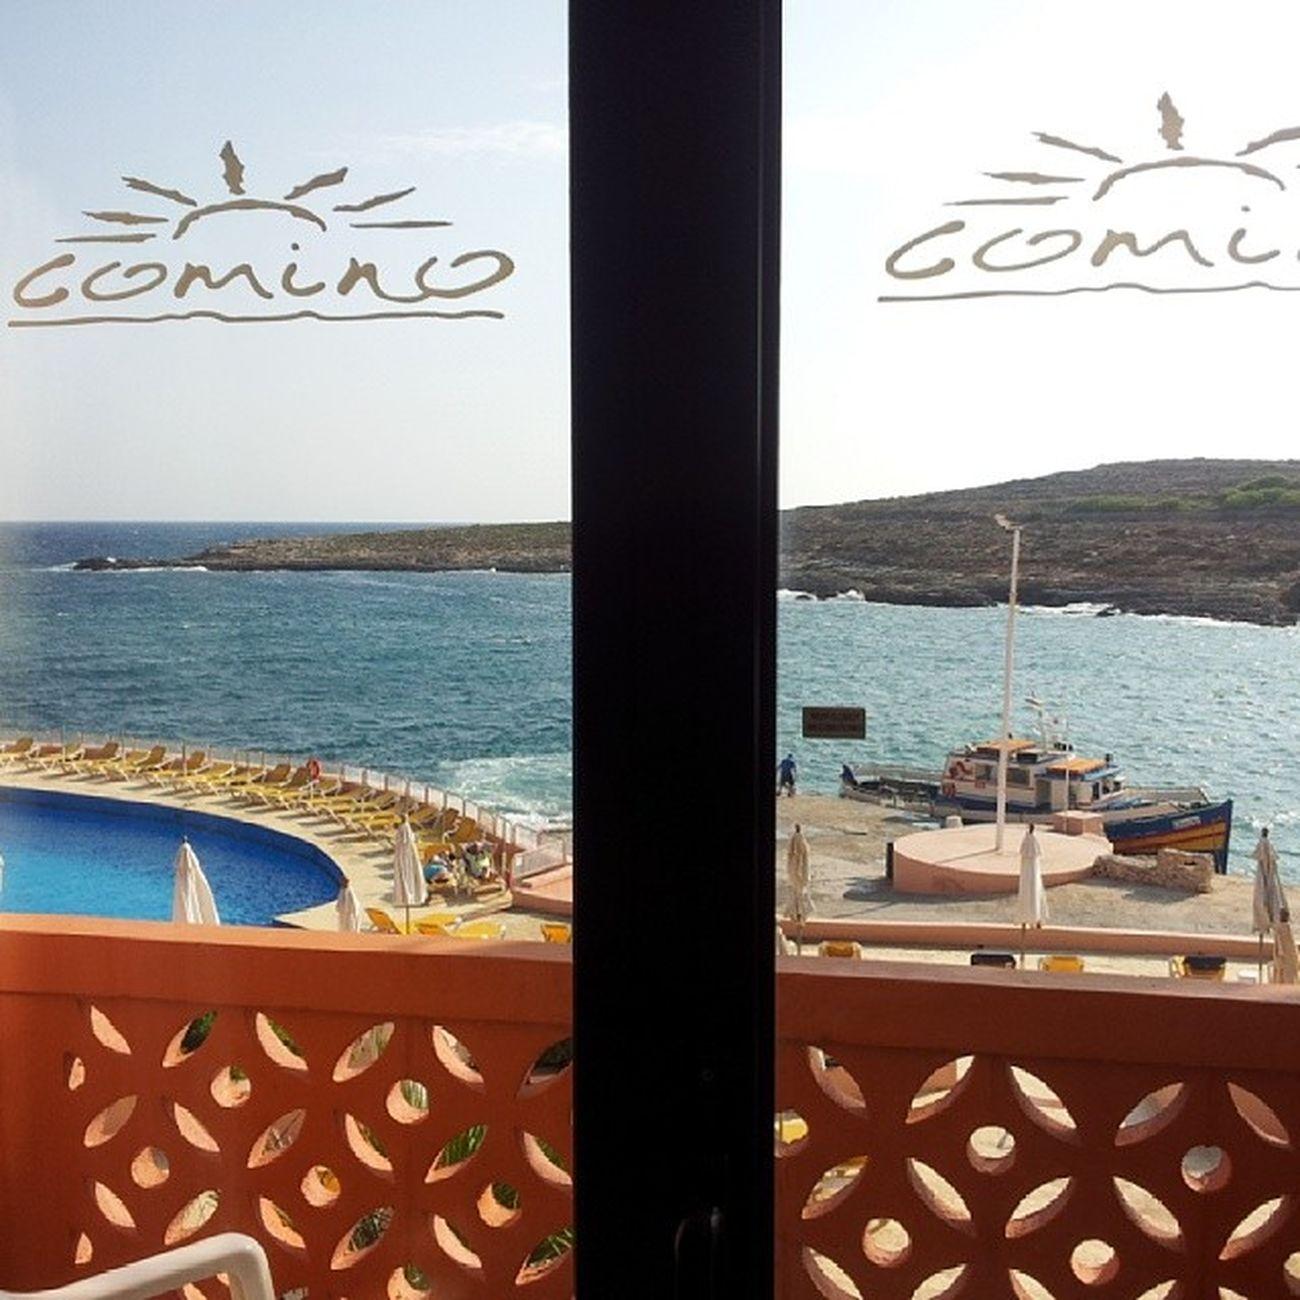 Sky Comino Visitcomino Cominoboat sea